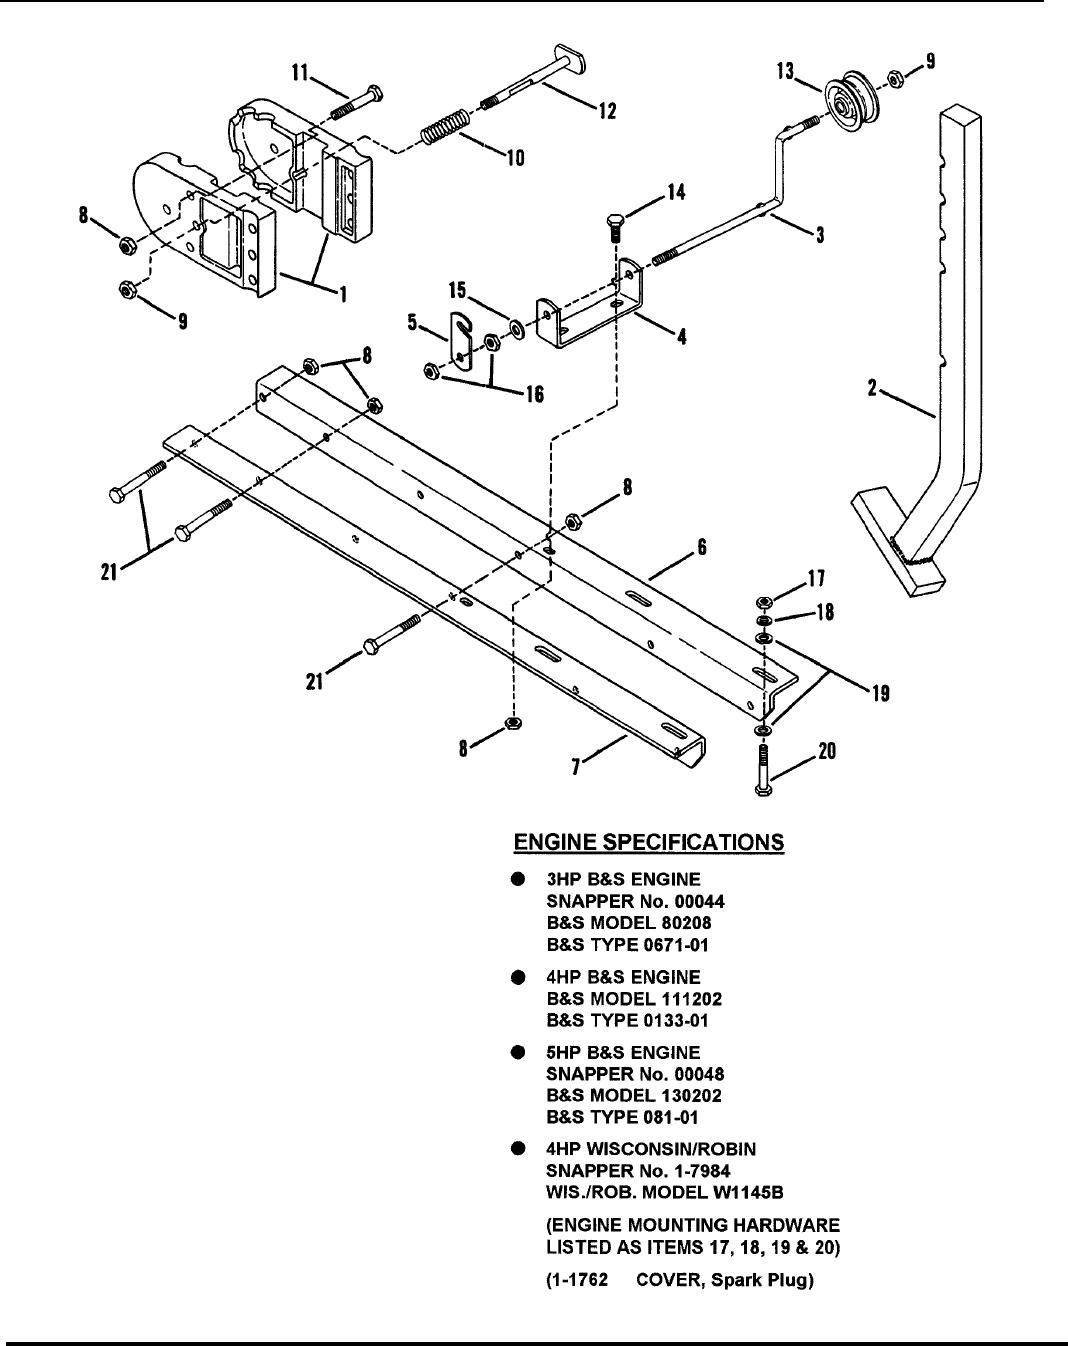 snapper 500trc users manual partsmanual Simple Engine Diagram frame skid arm